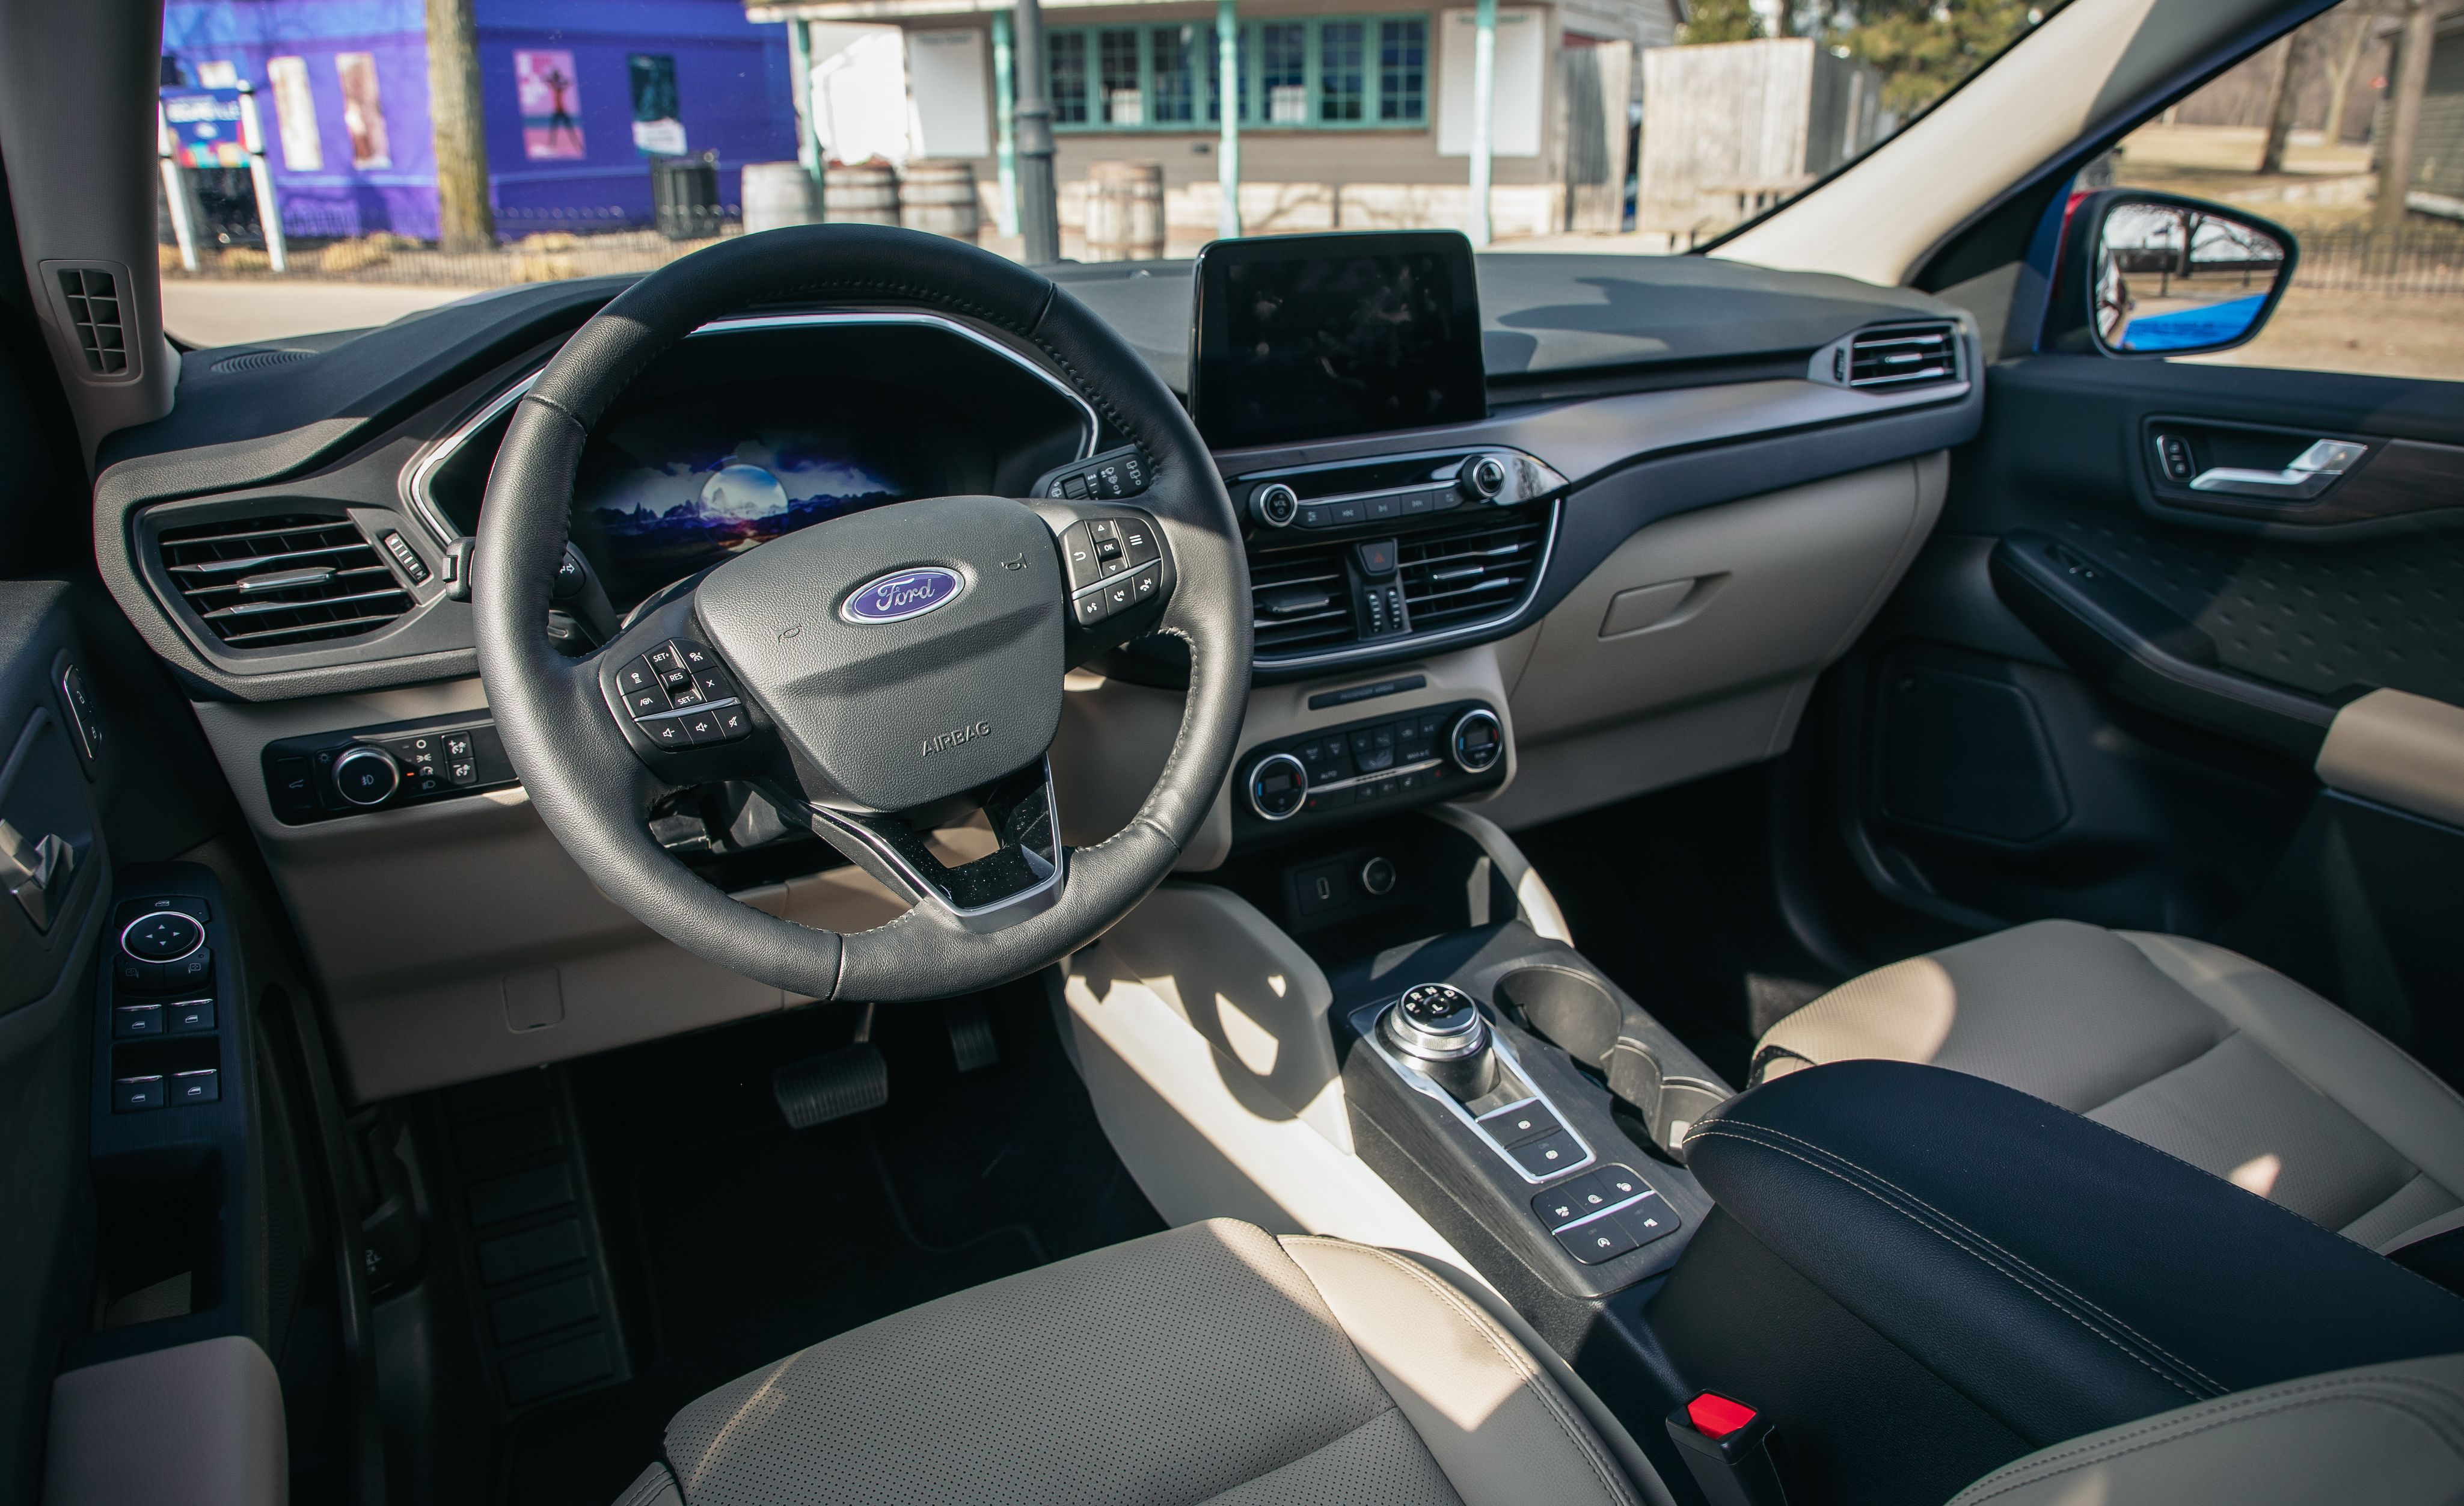 2020-ford-escape-140-1554146689.jpg